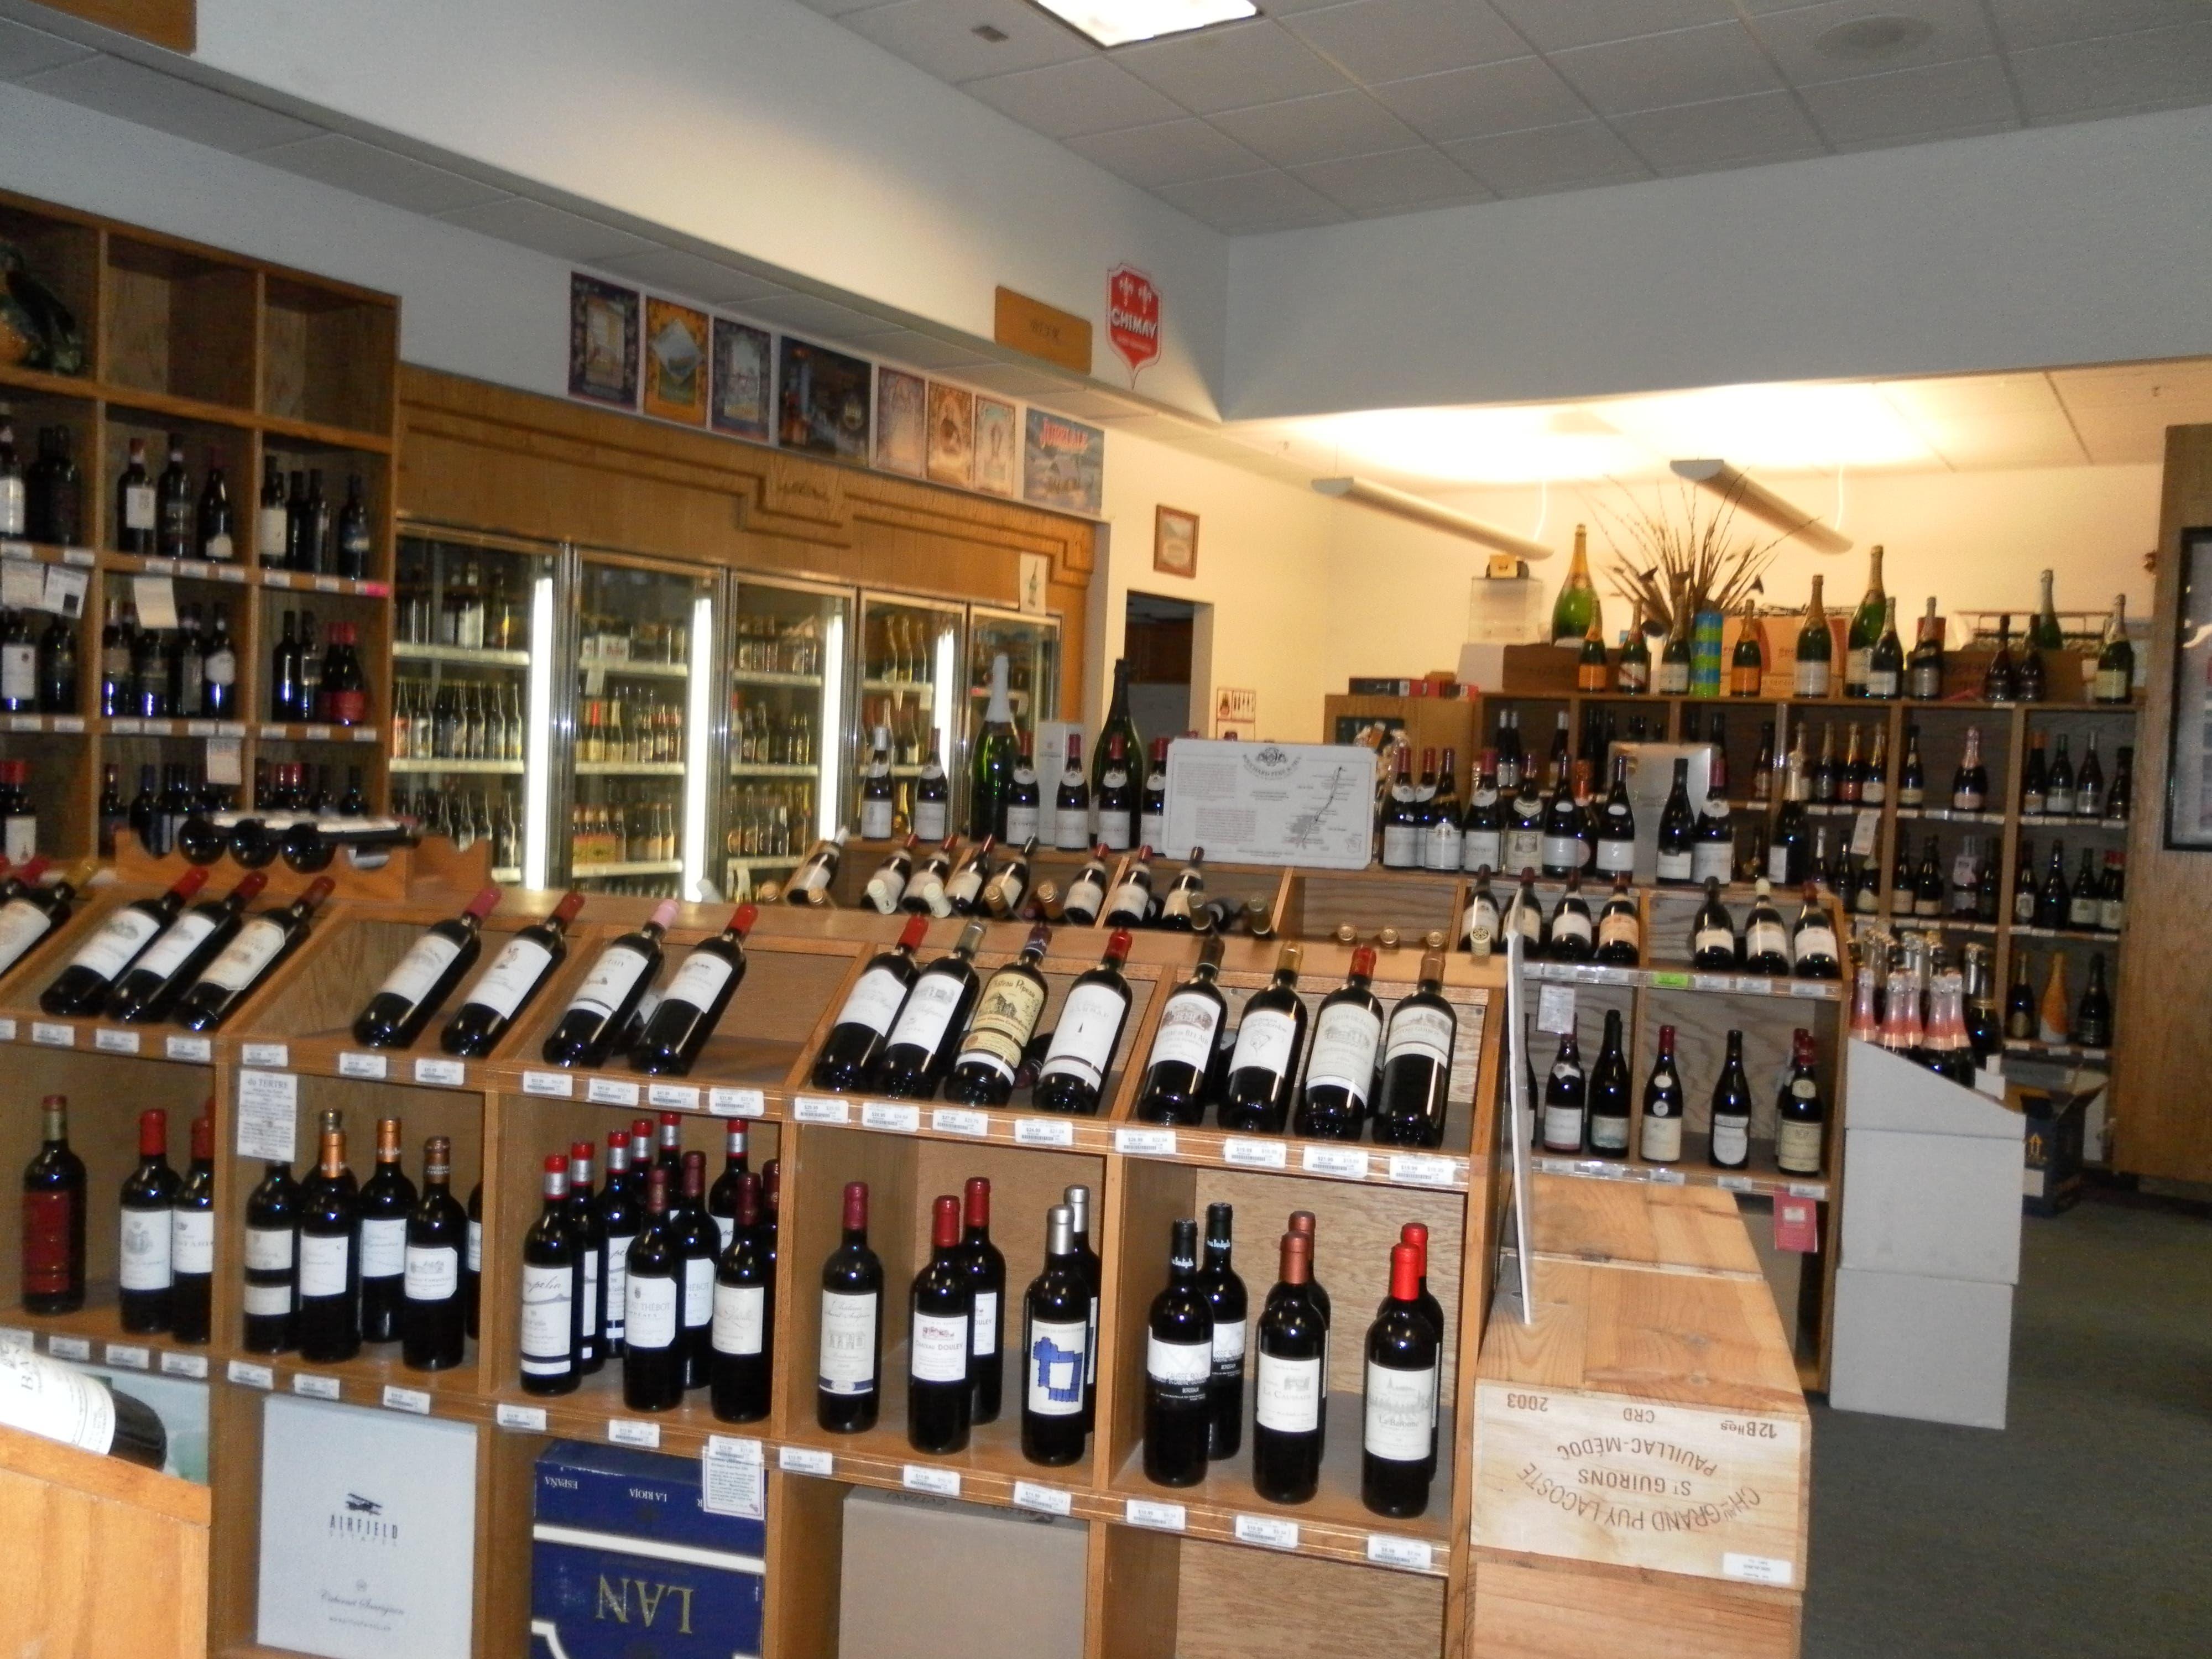 Cork Dork: Retailers Greet Washington Wine Month With Mixed